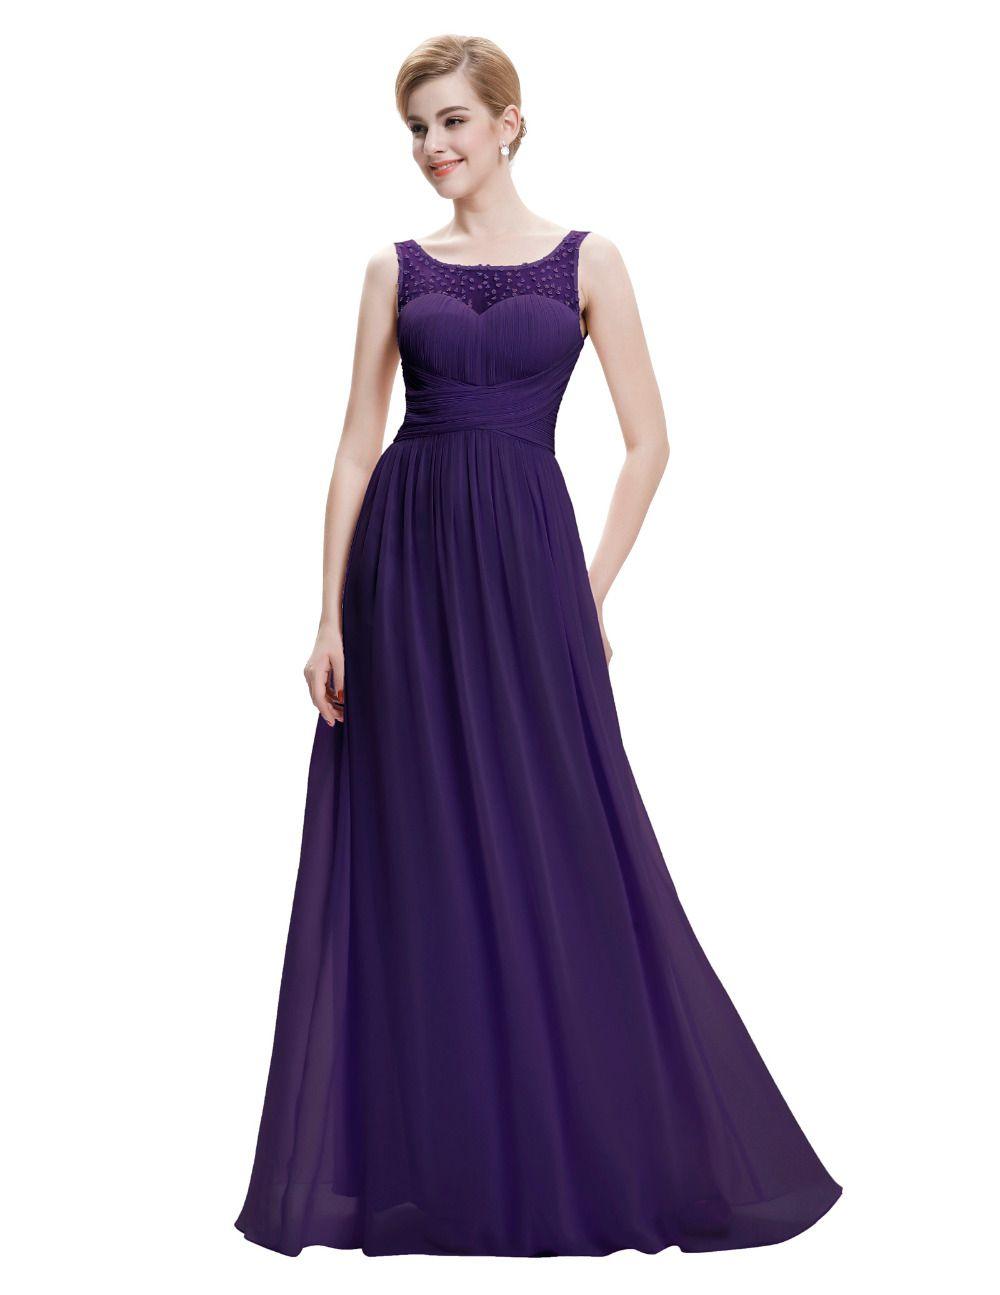 Aliexpress.com: Comprar Vestido de Noche Robe De Soirée Abendkleider ...